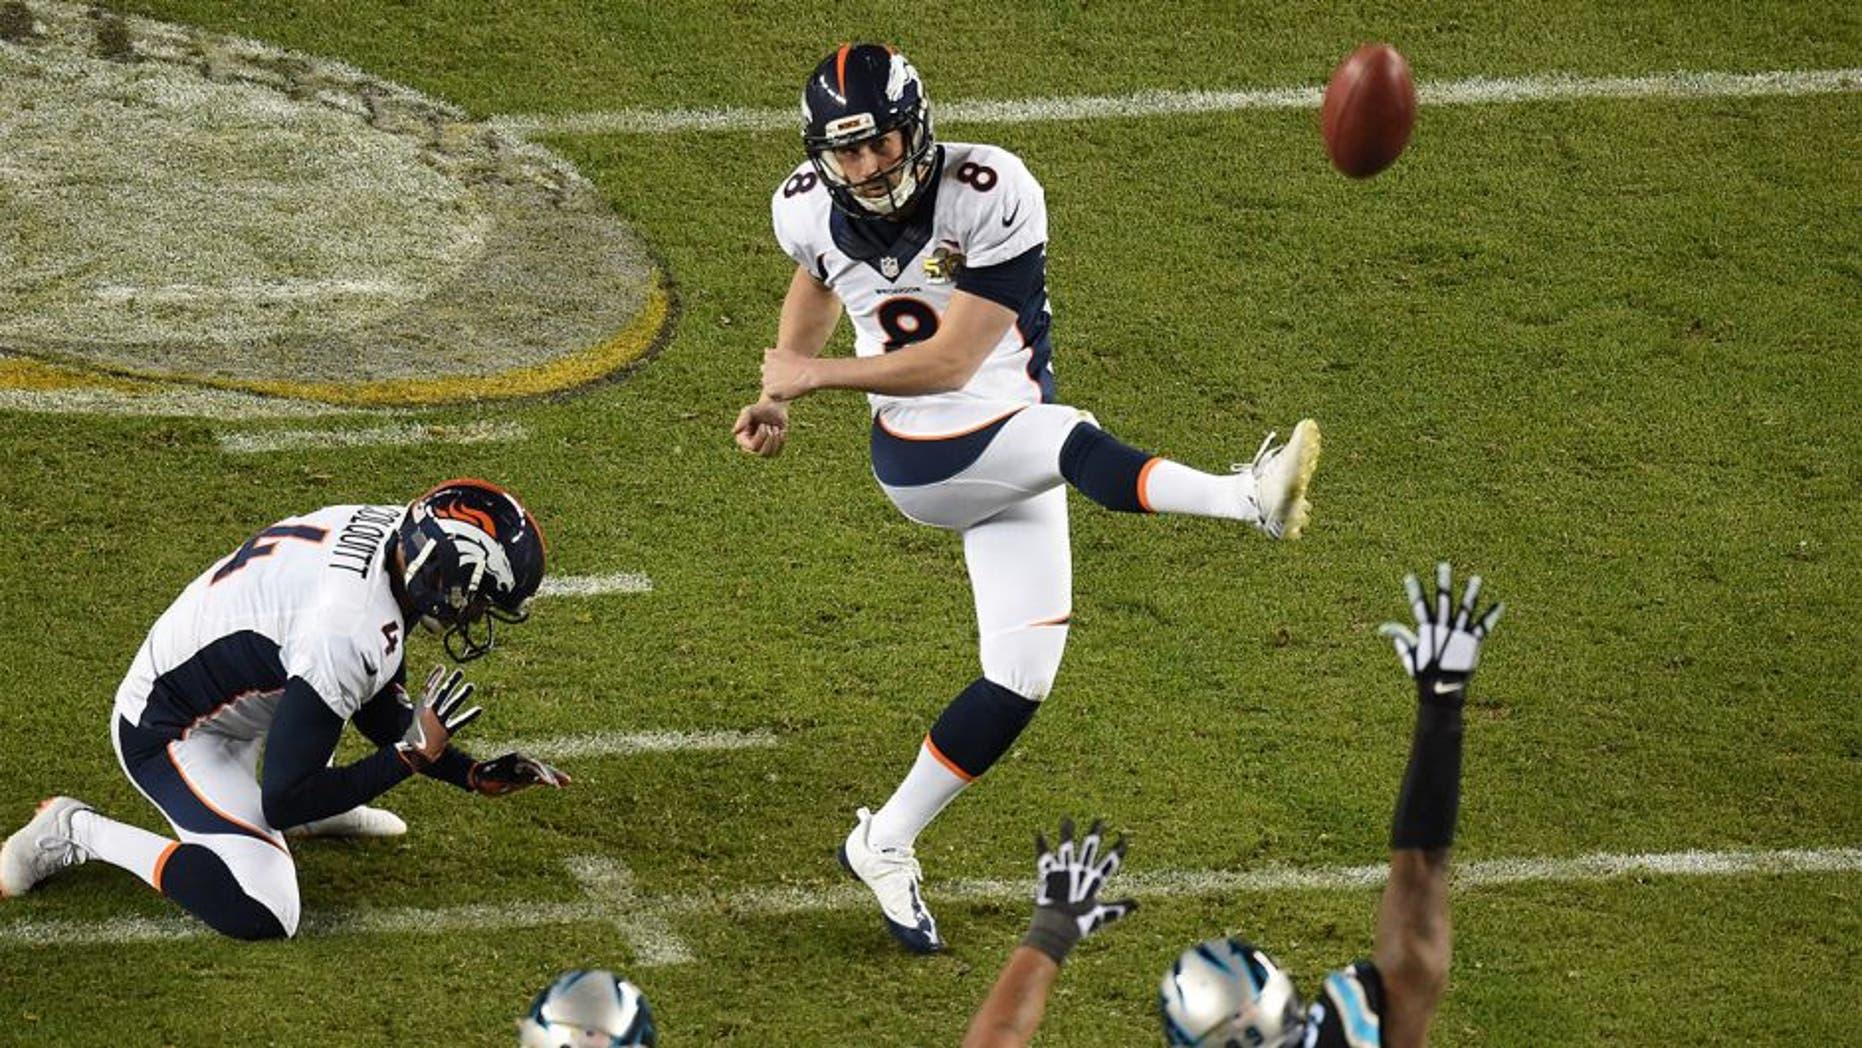 Feb 7, 2016; Santa Clara, CA, USA;Denver Broncos kicker Brandon McManus (8) kicks a third quarter field goal in Super Bowl 50 at Levi's Stadium. Mandatory Credit: Ed Szczepanski-USA TODAY Sports